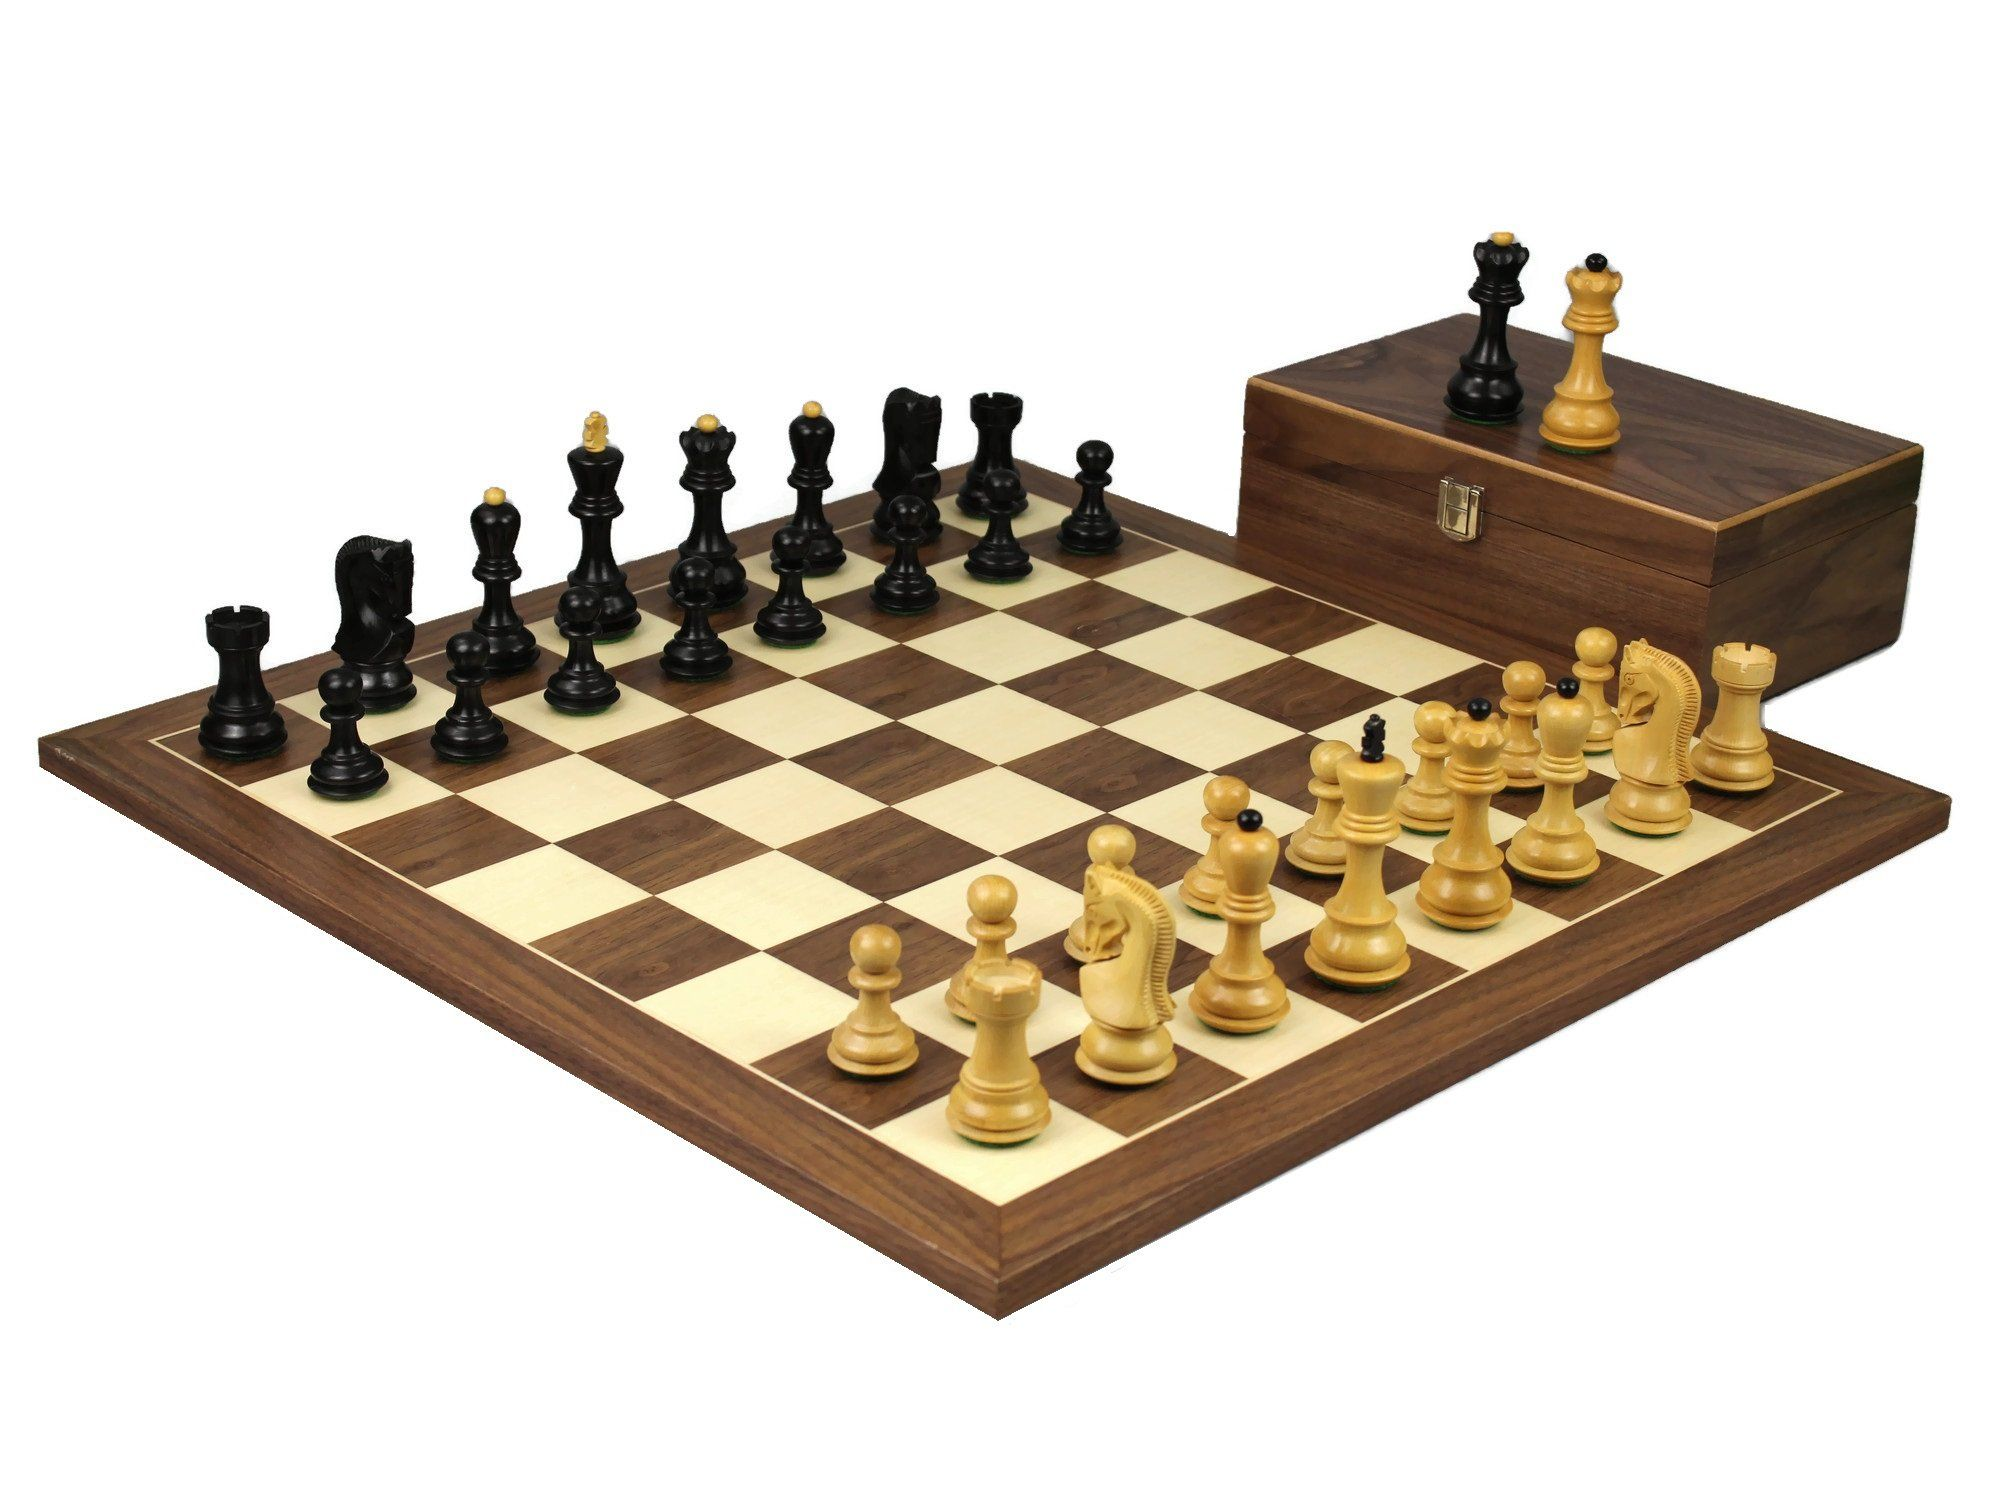 19 wooden chess set wooden chess wooden chess board